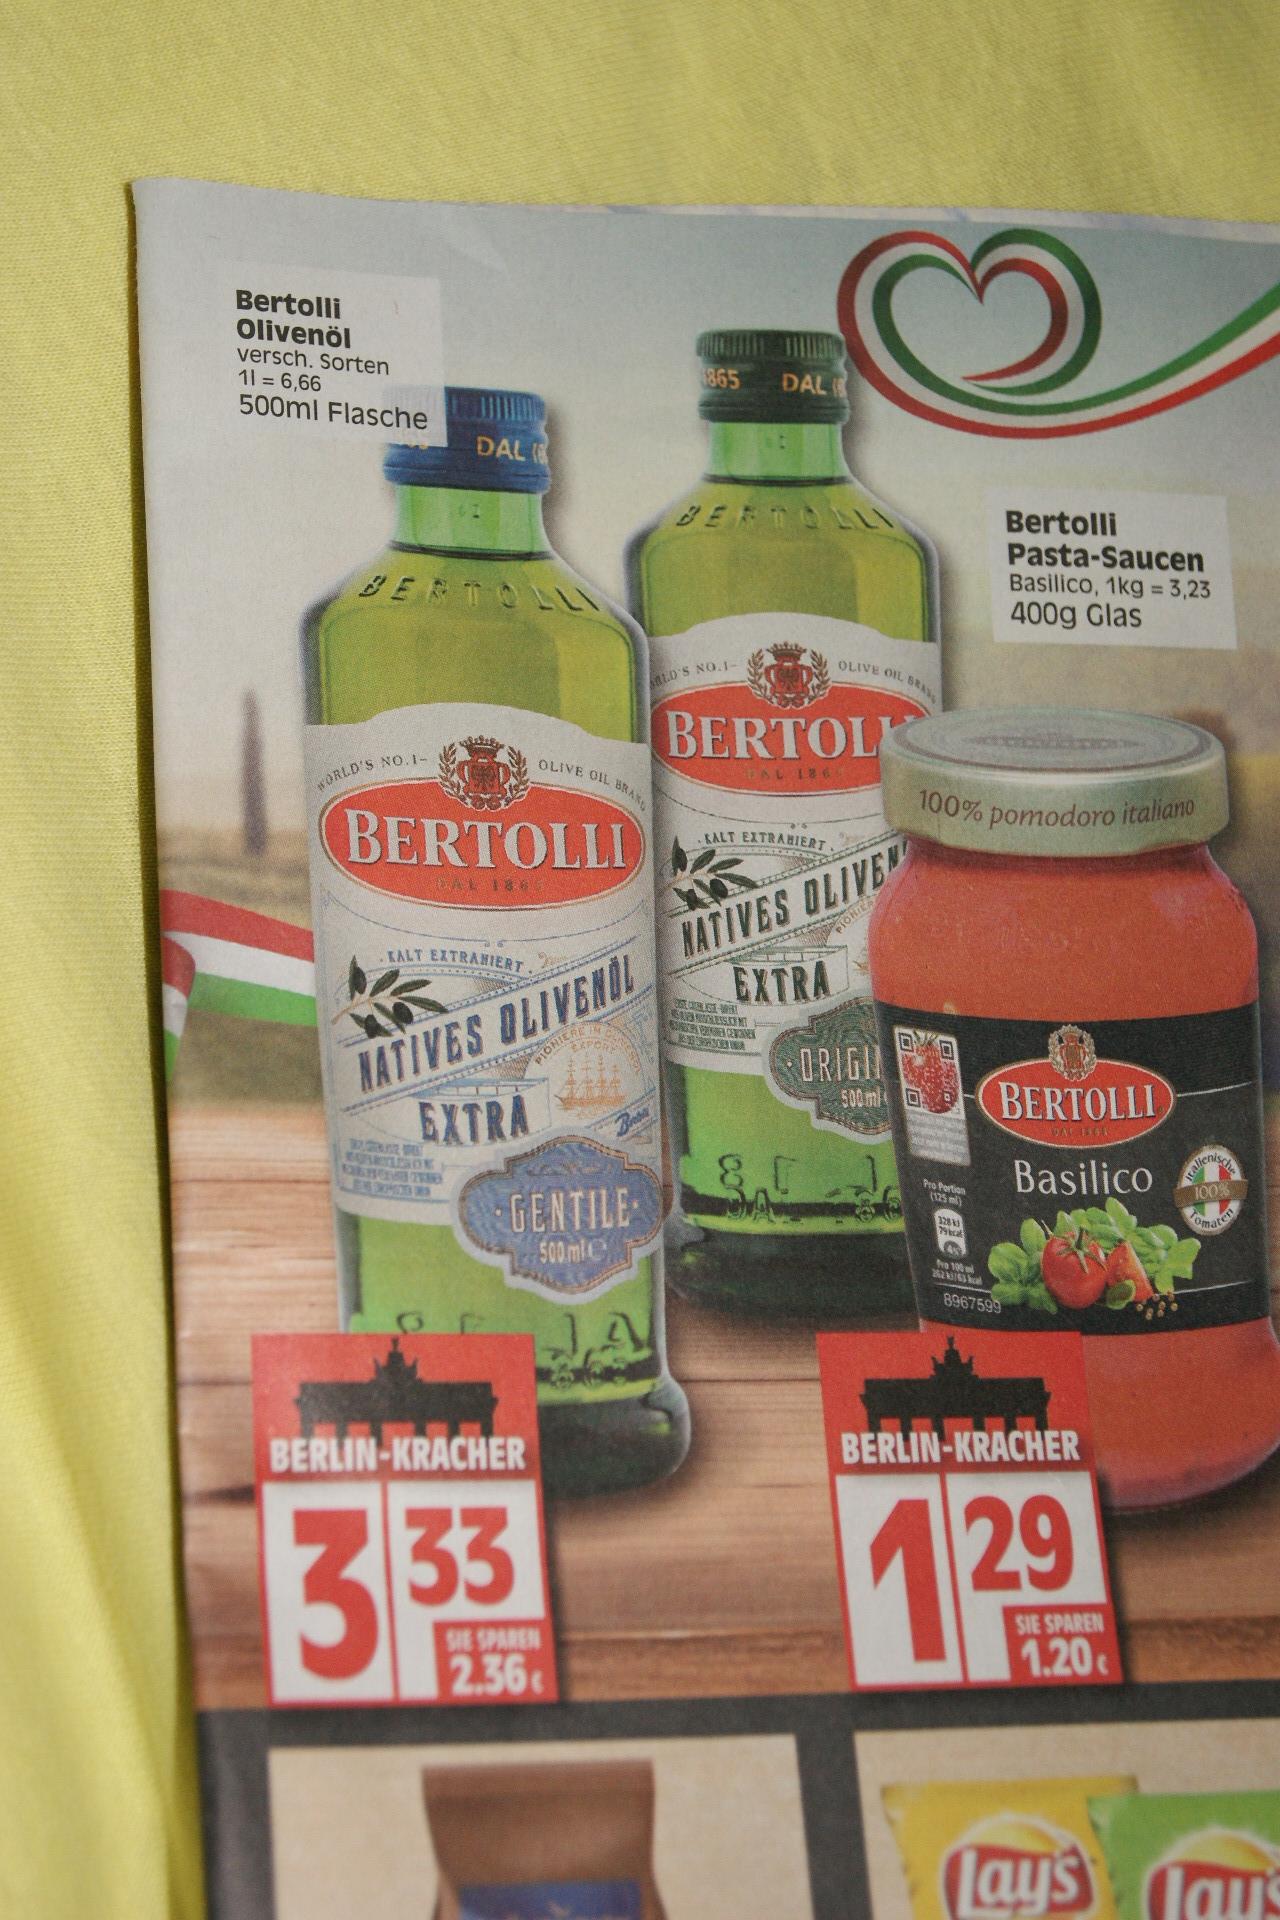 Bertolli Olivenöle nur 3,33 Euro je 500ml-Flasche (lokal Berlin)